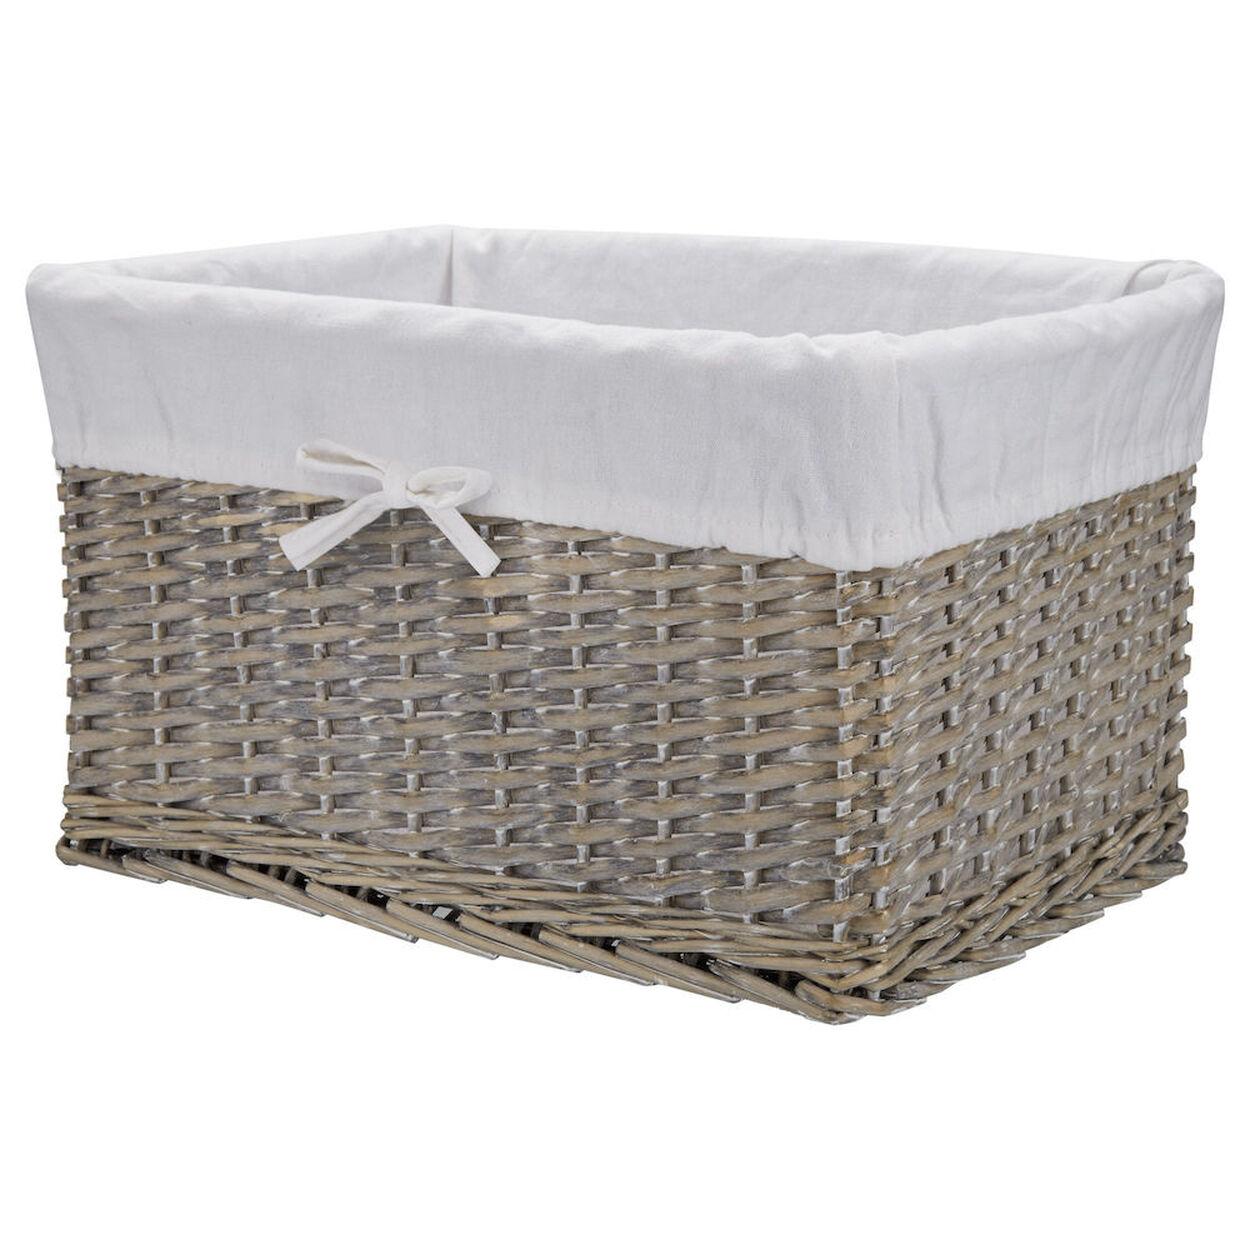 Medium Willow Basket with Lining